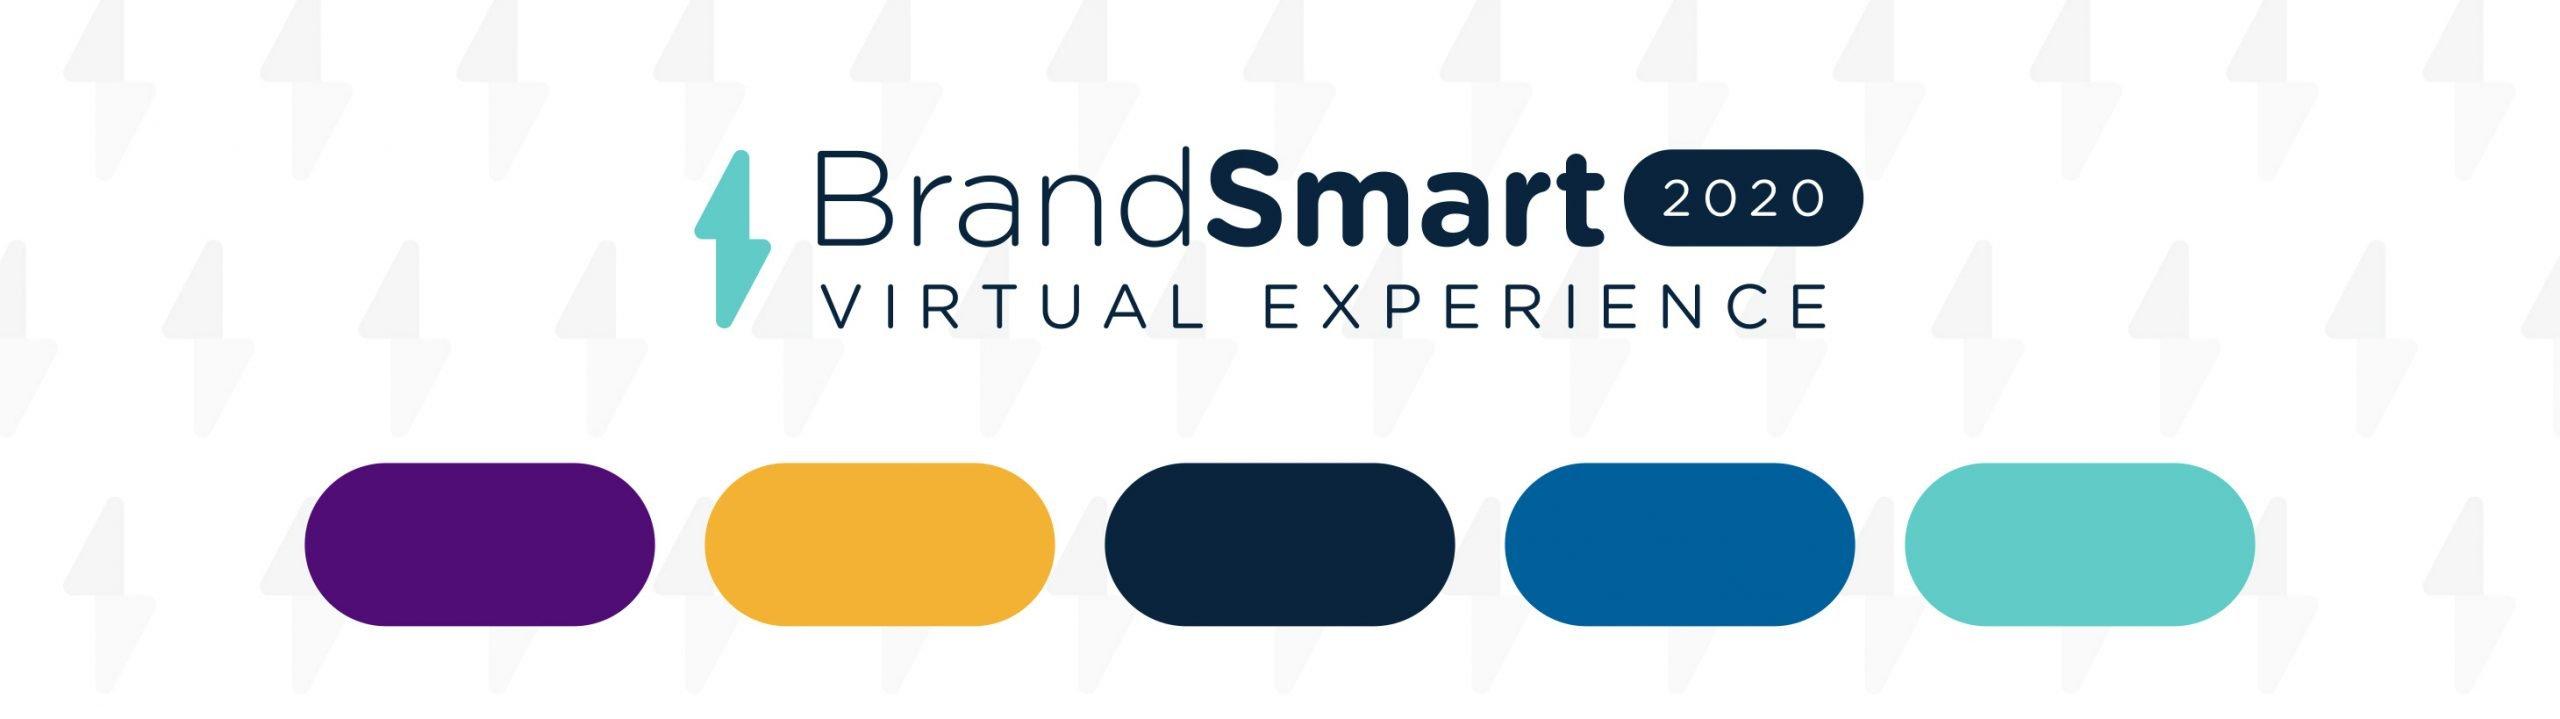 BrandSmart-Identity